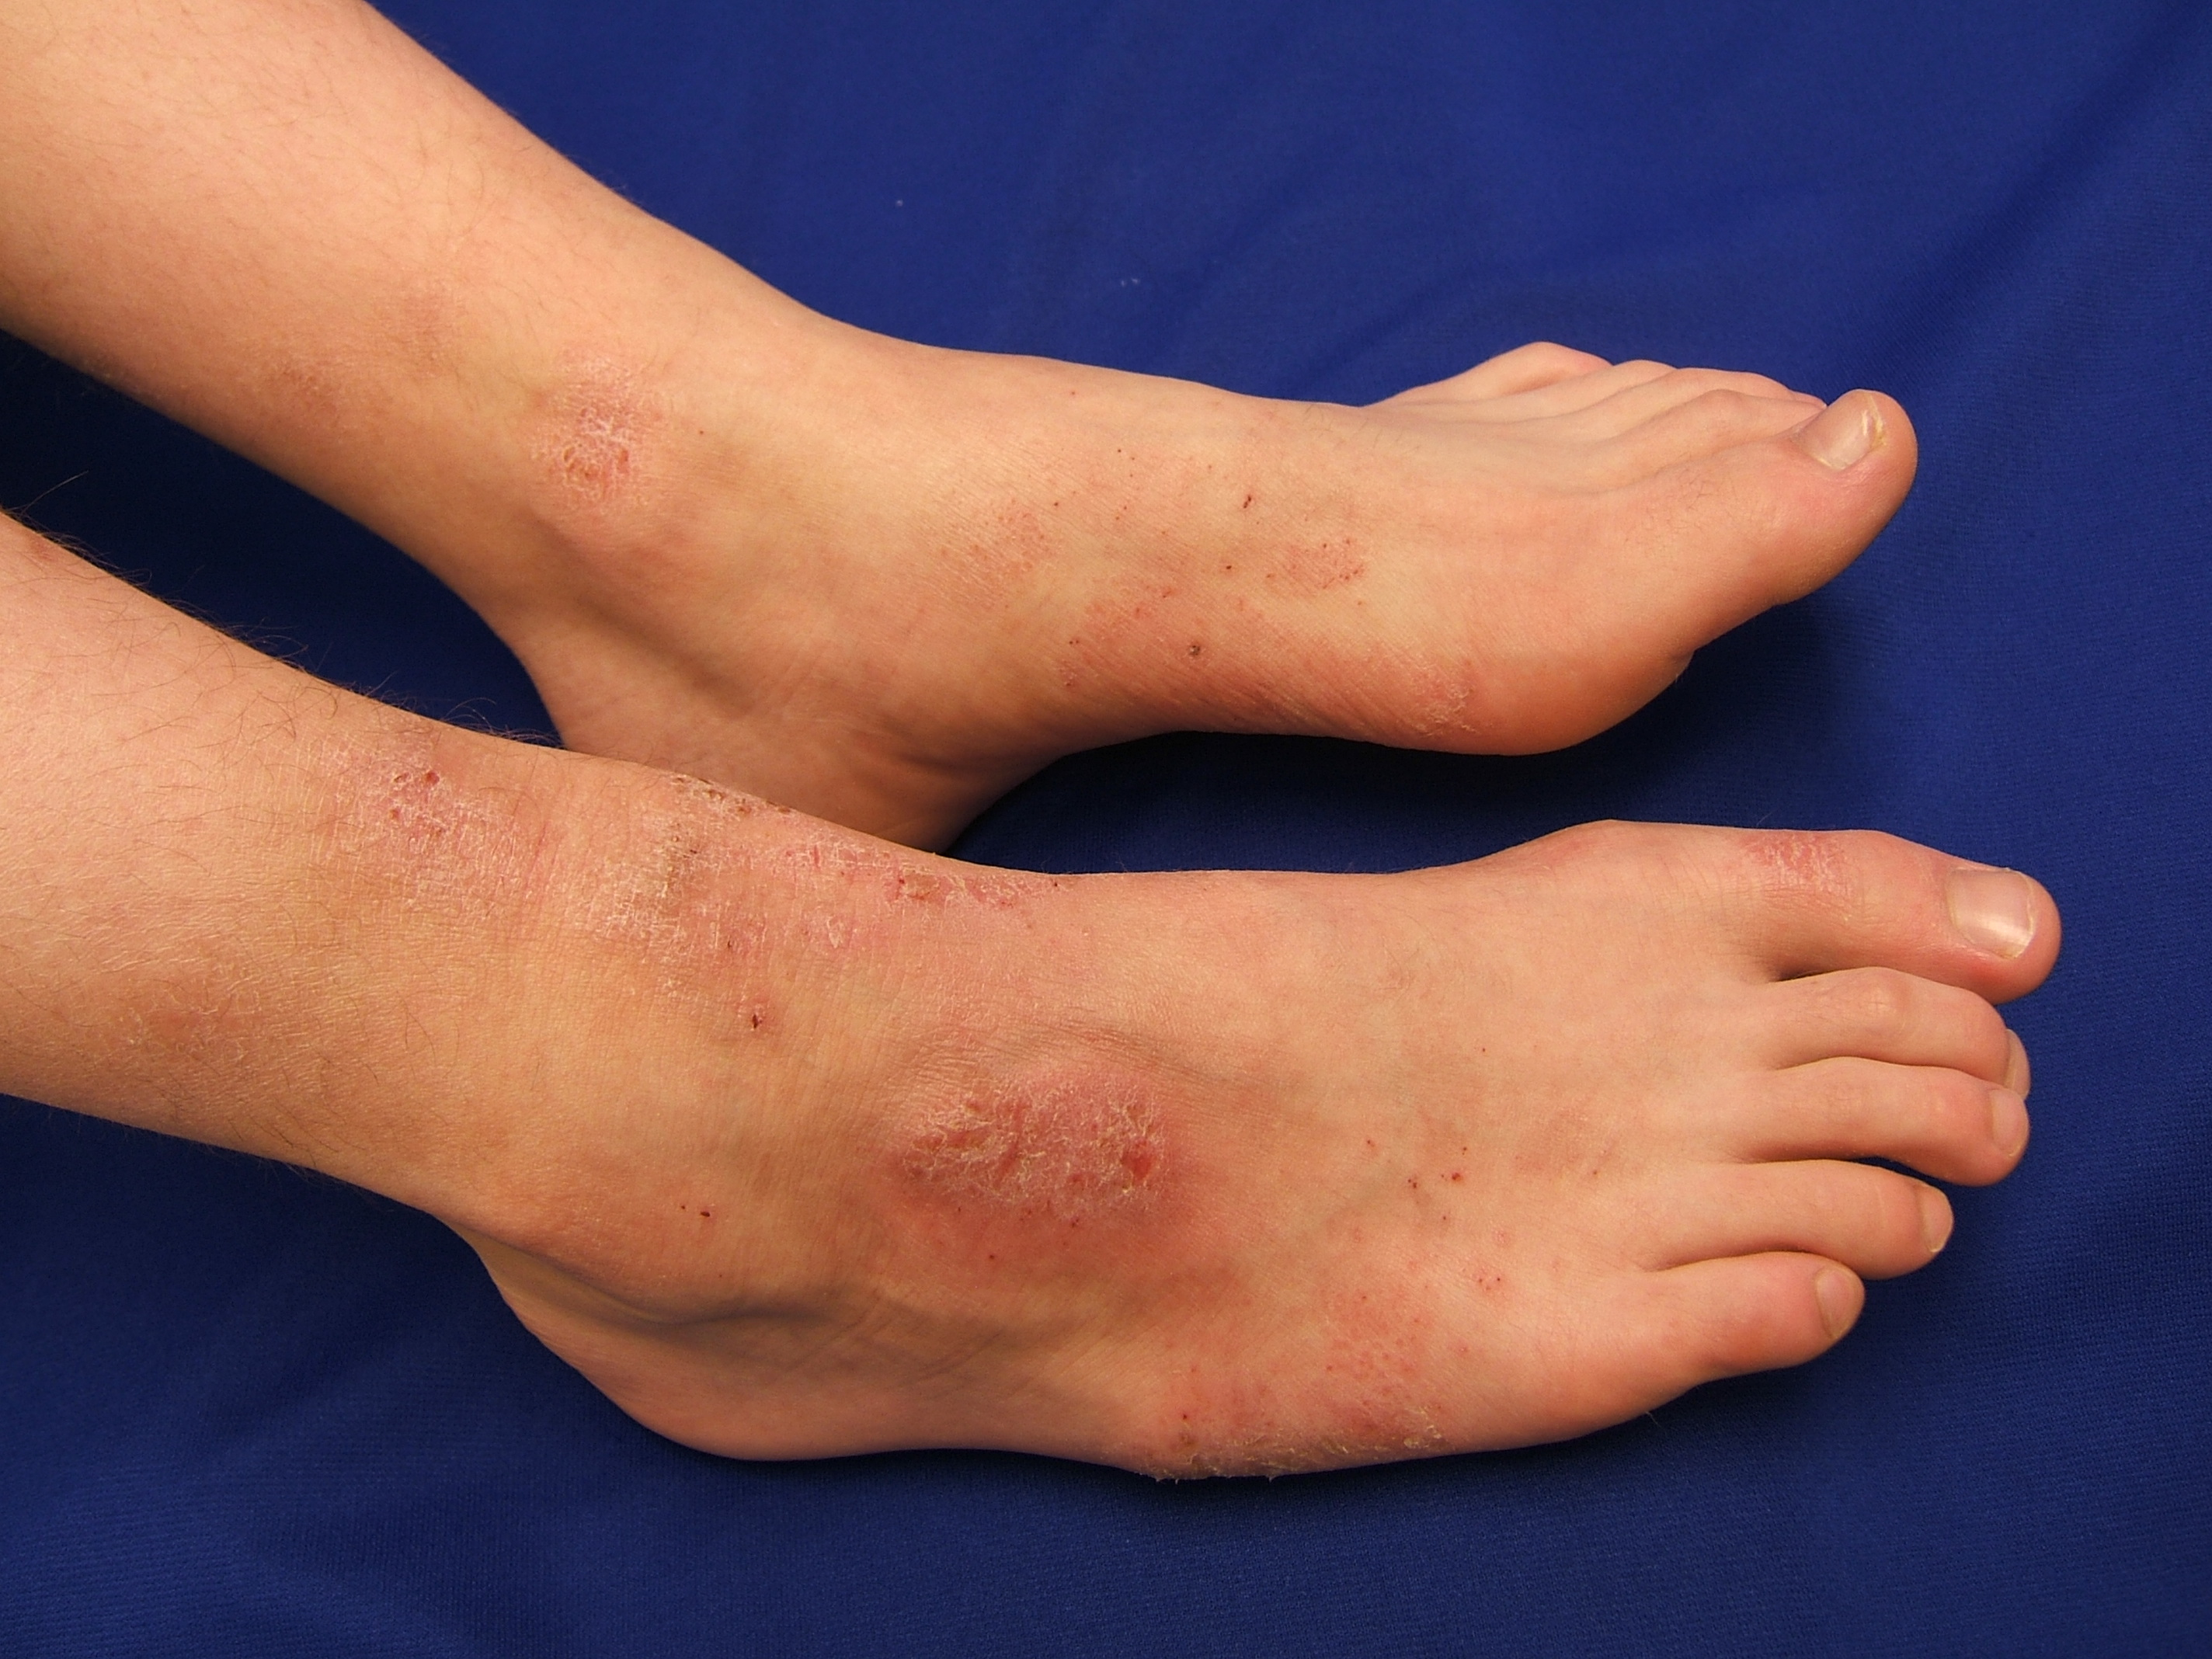 eczema symptoms causes treatments types triggers